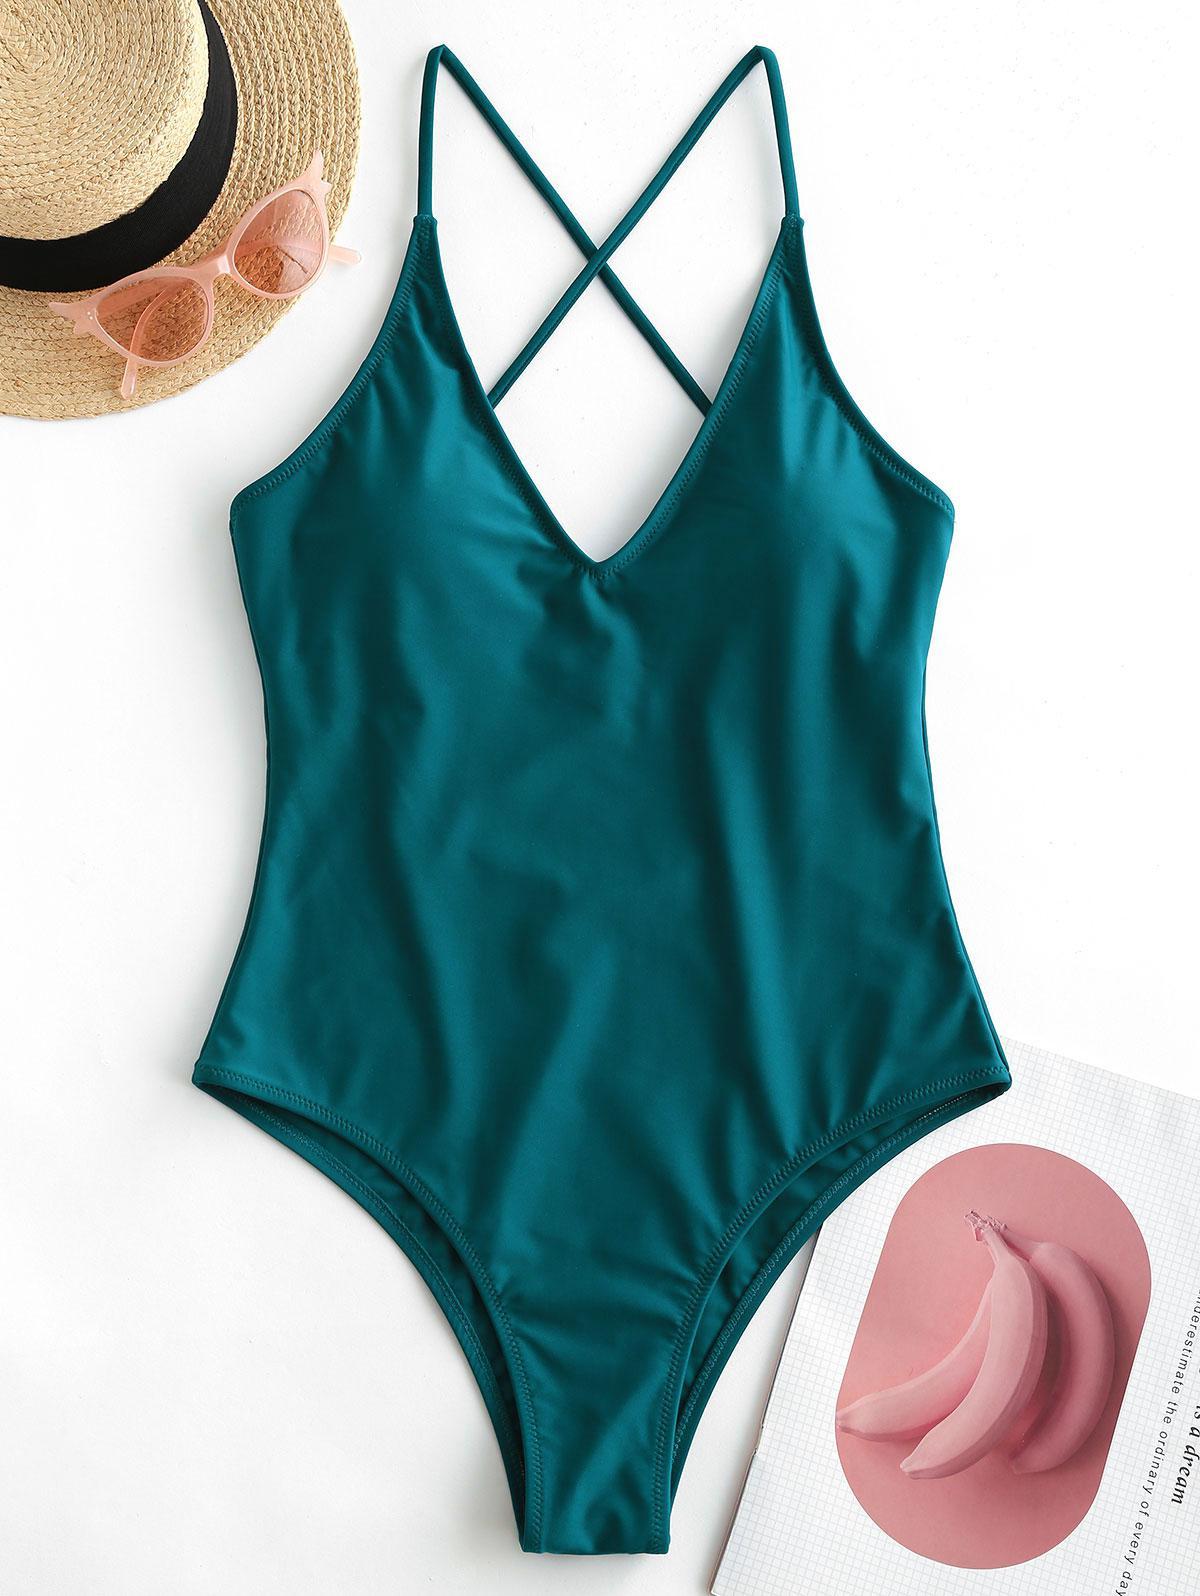 ZAFUL Criss Cross Basic One-piece Swimsuit thumbnail